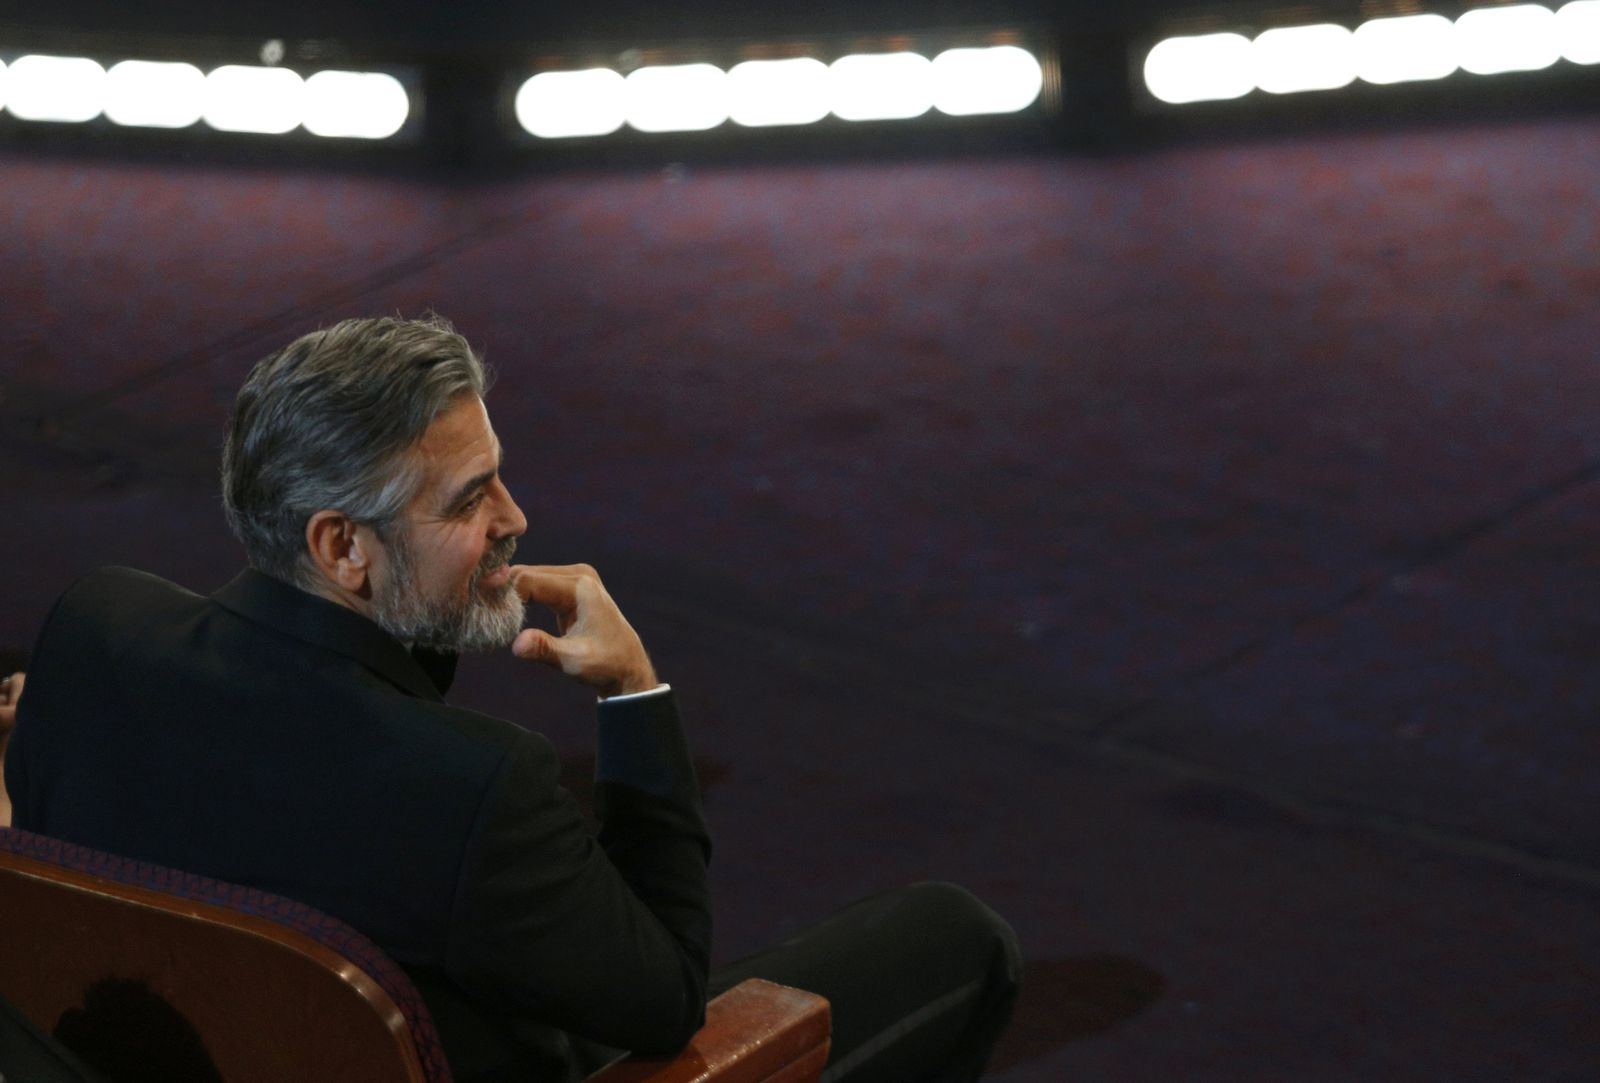 George Clooney / Oscars